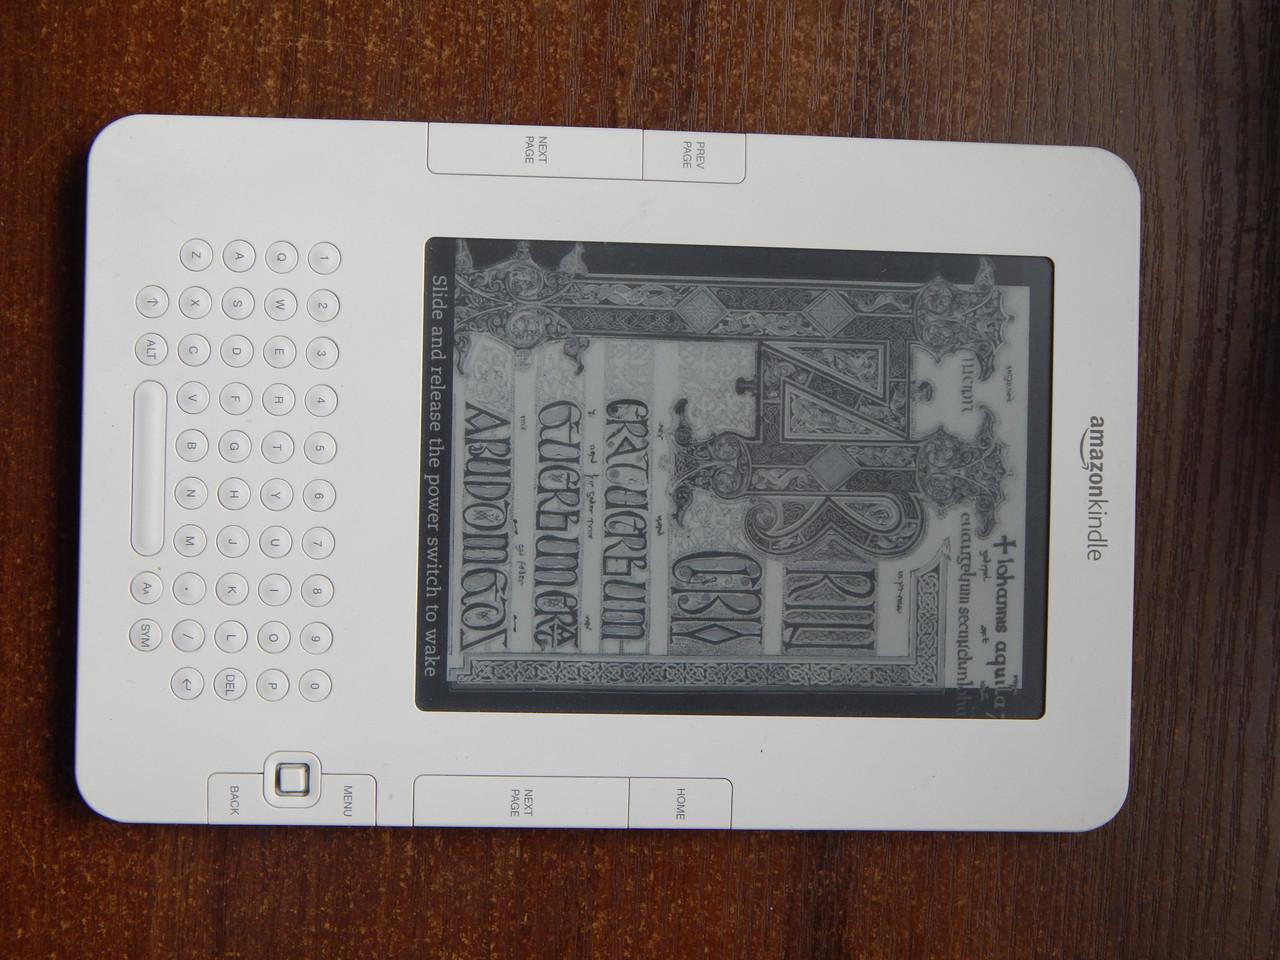 Электронная книга amazon kindle  keyboard 2nd Generation D00701